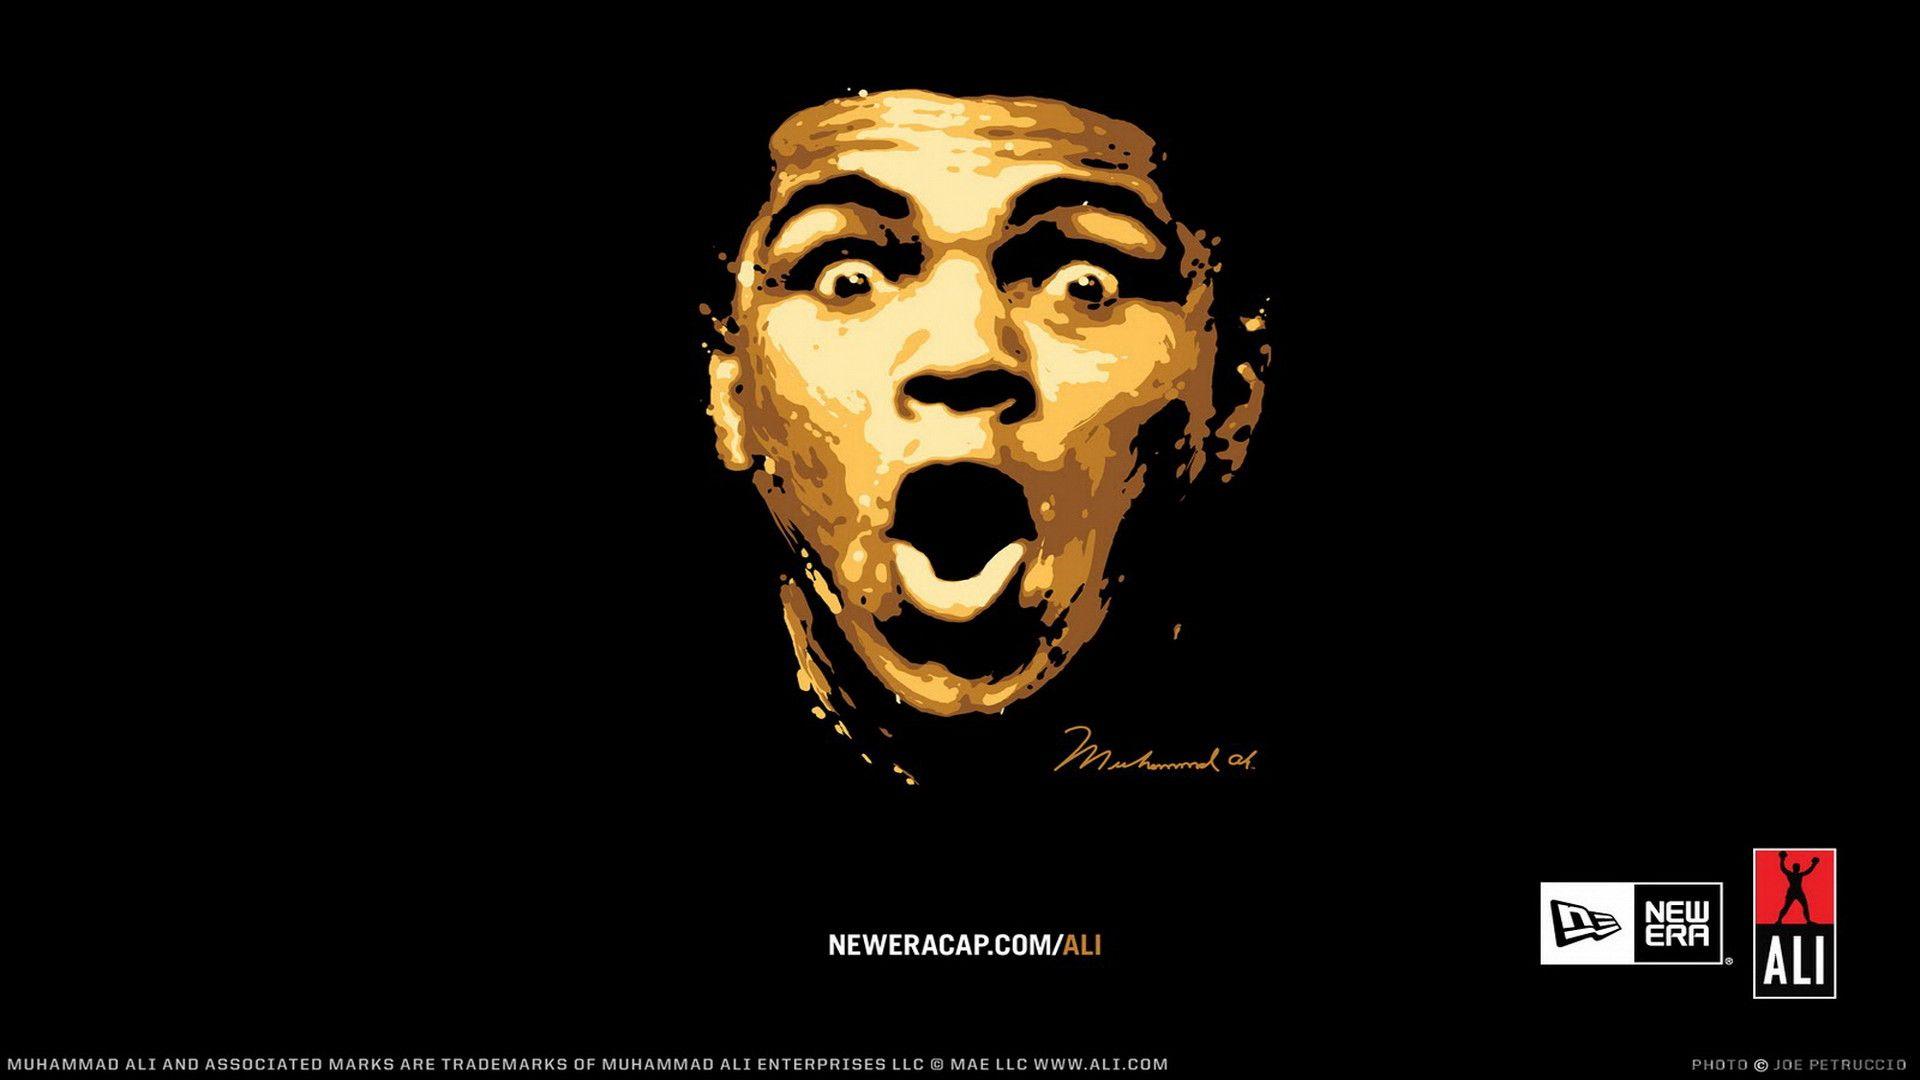 Uncharted Iphone Wallpaper 10 Best Muhammad Ali Wallpapers Hd Inspirationseek Com